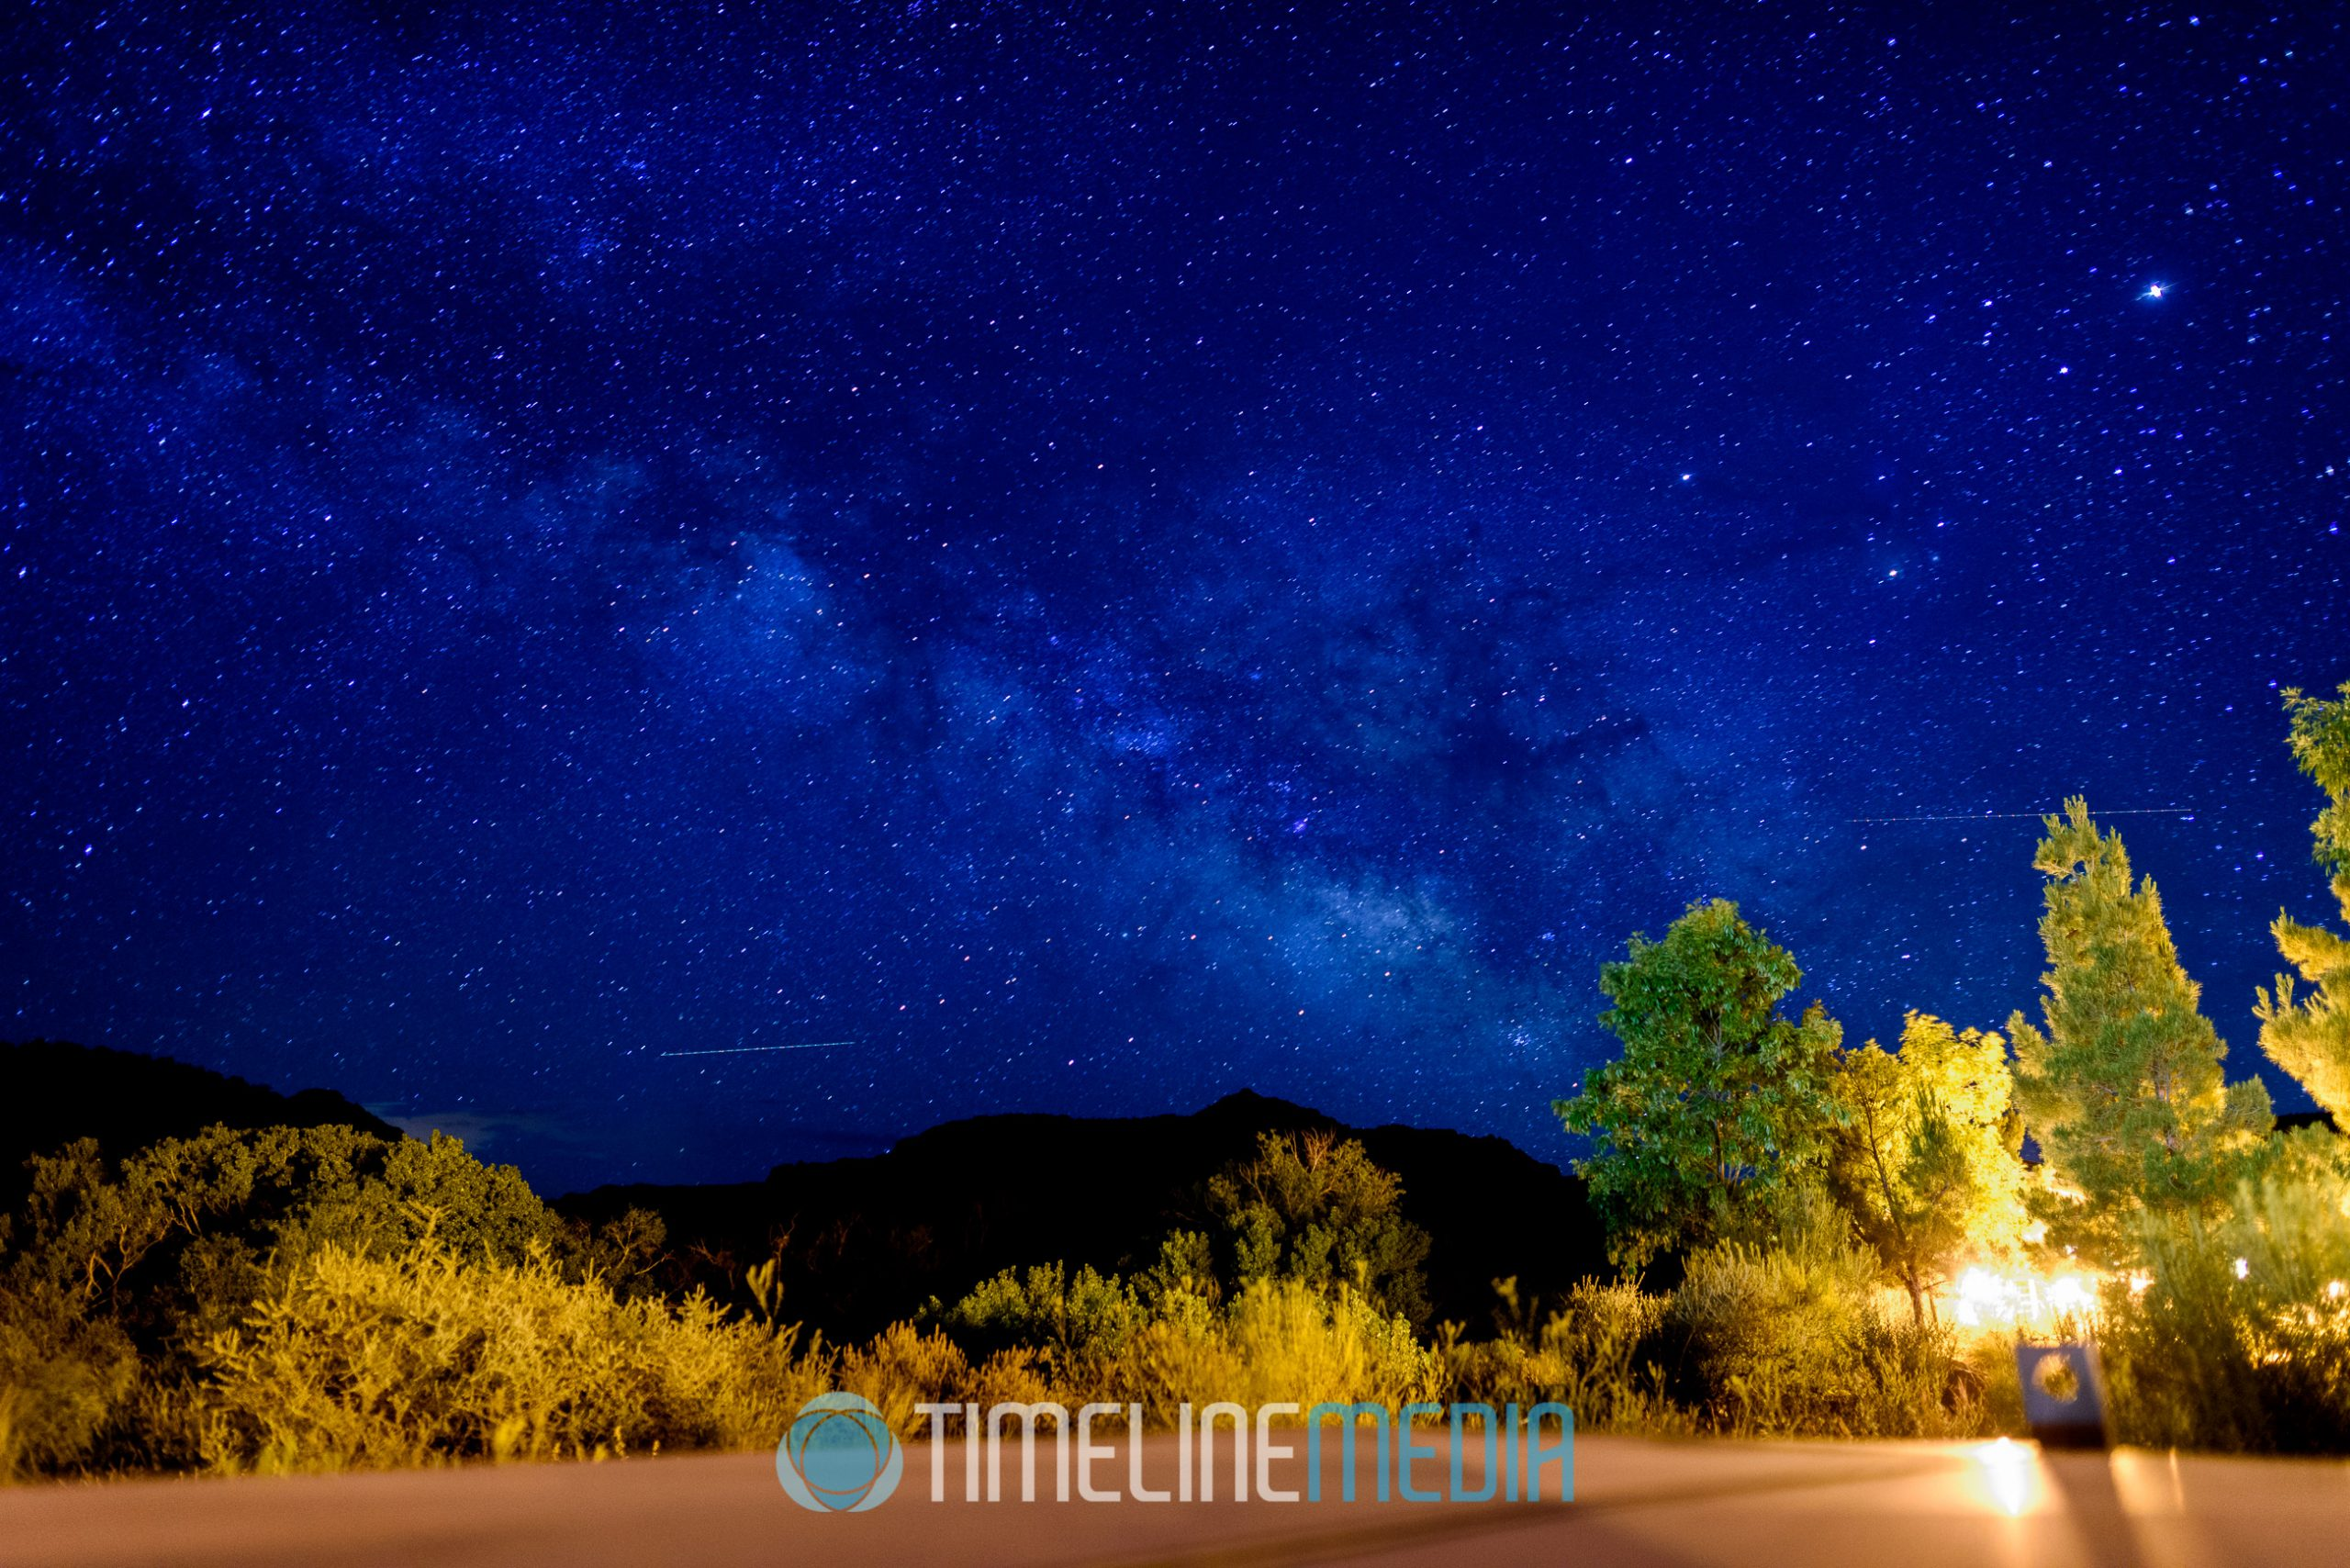 Milky Way galaxy center over dark skies ©TimeLine Media